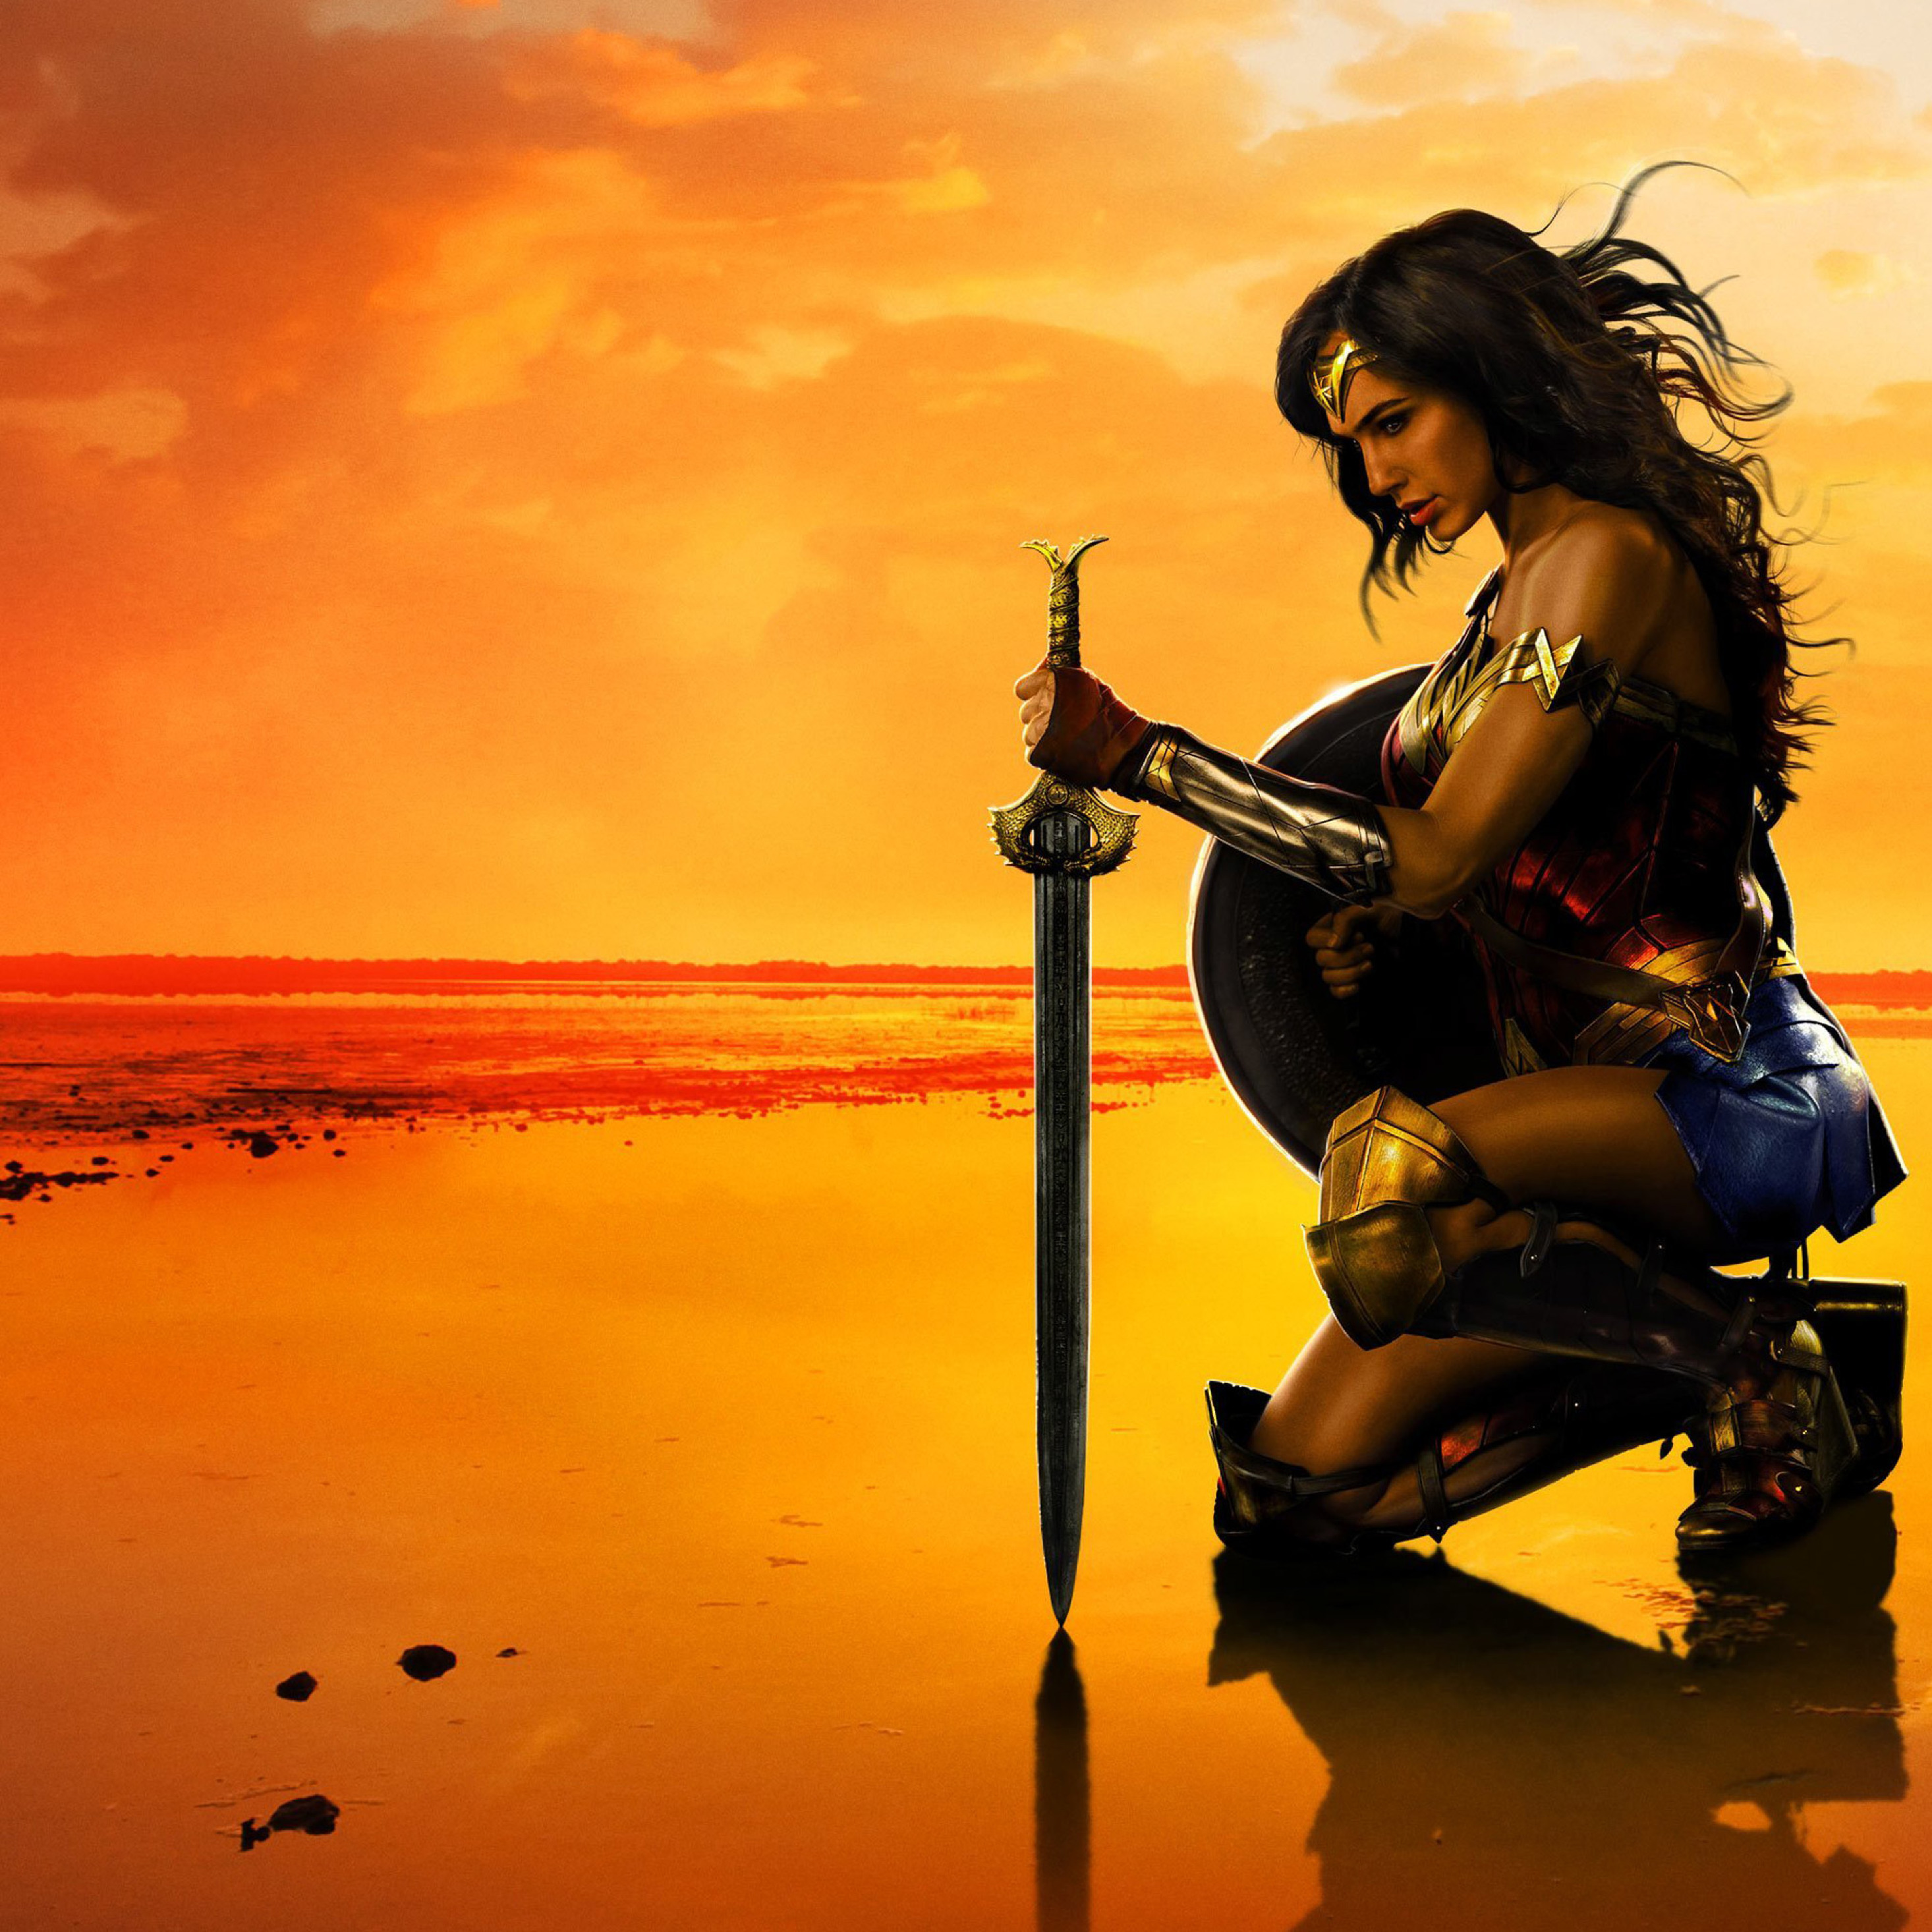 Wonder Woman Movie Poster, HD 4K Wallpaper